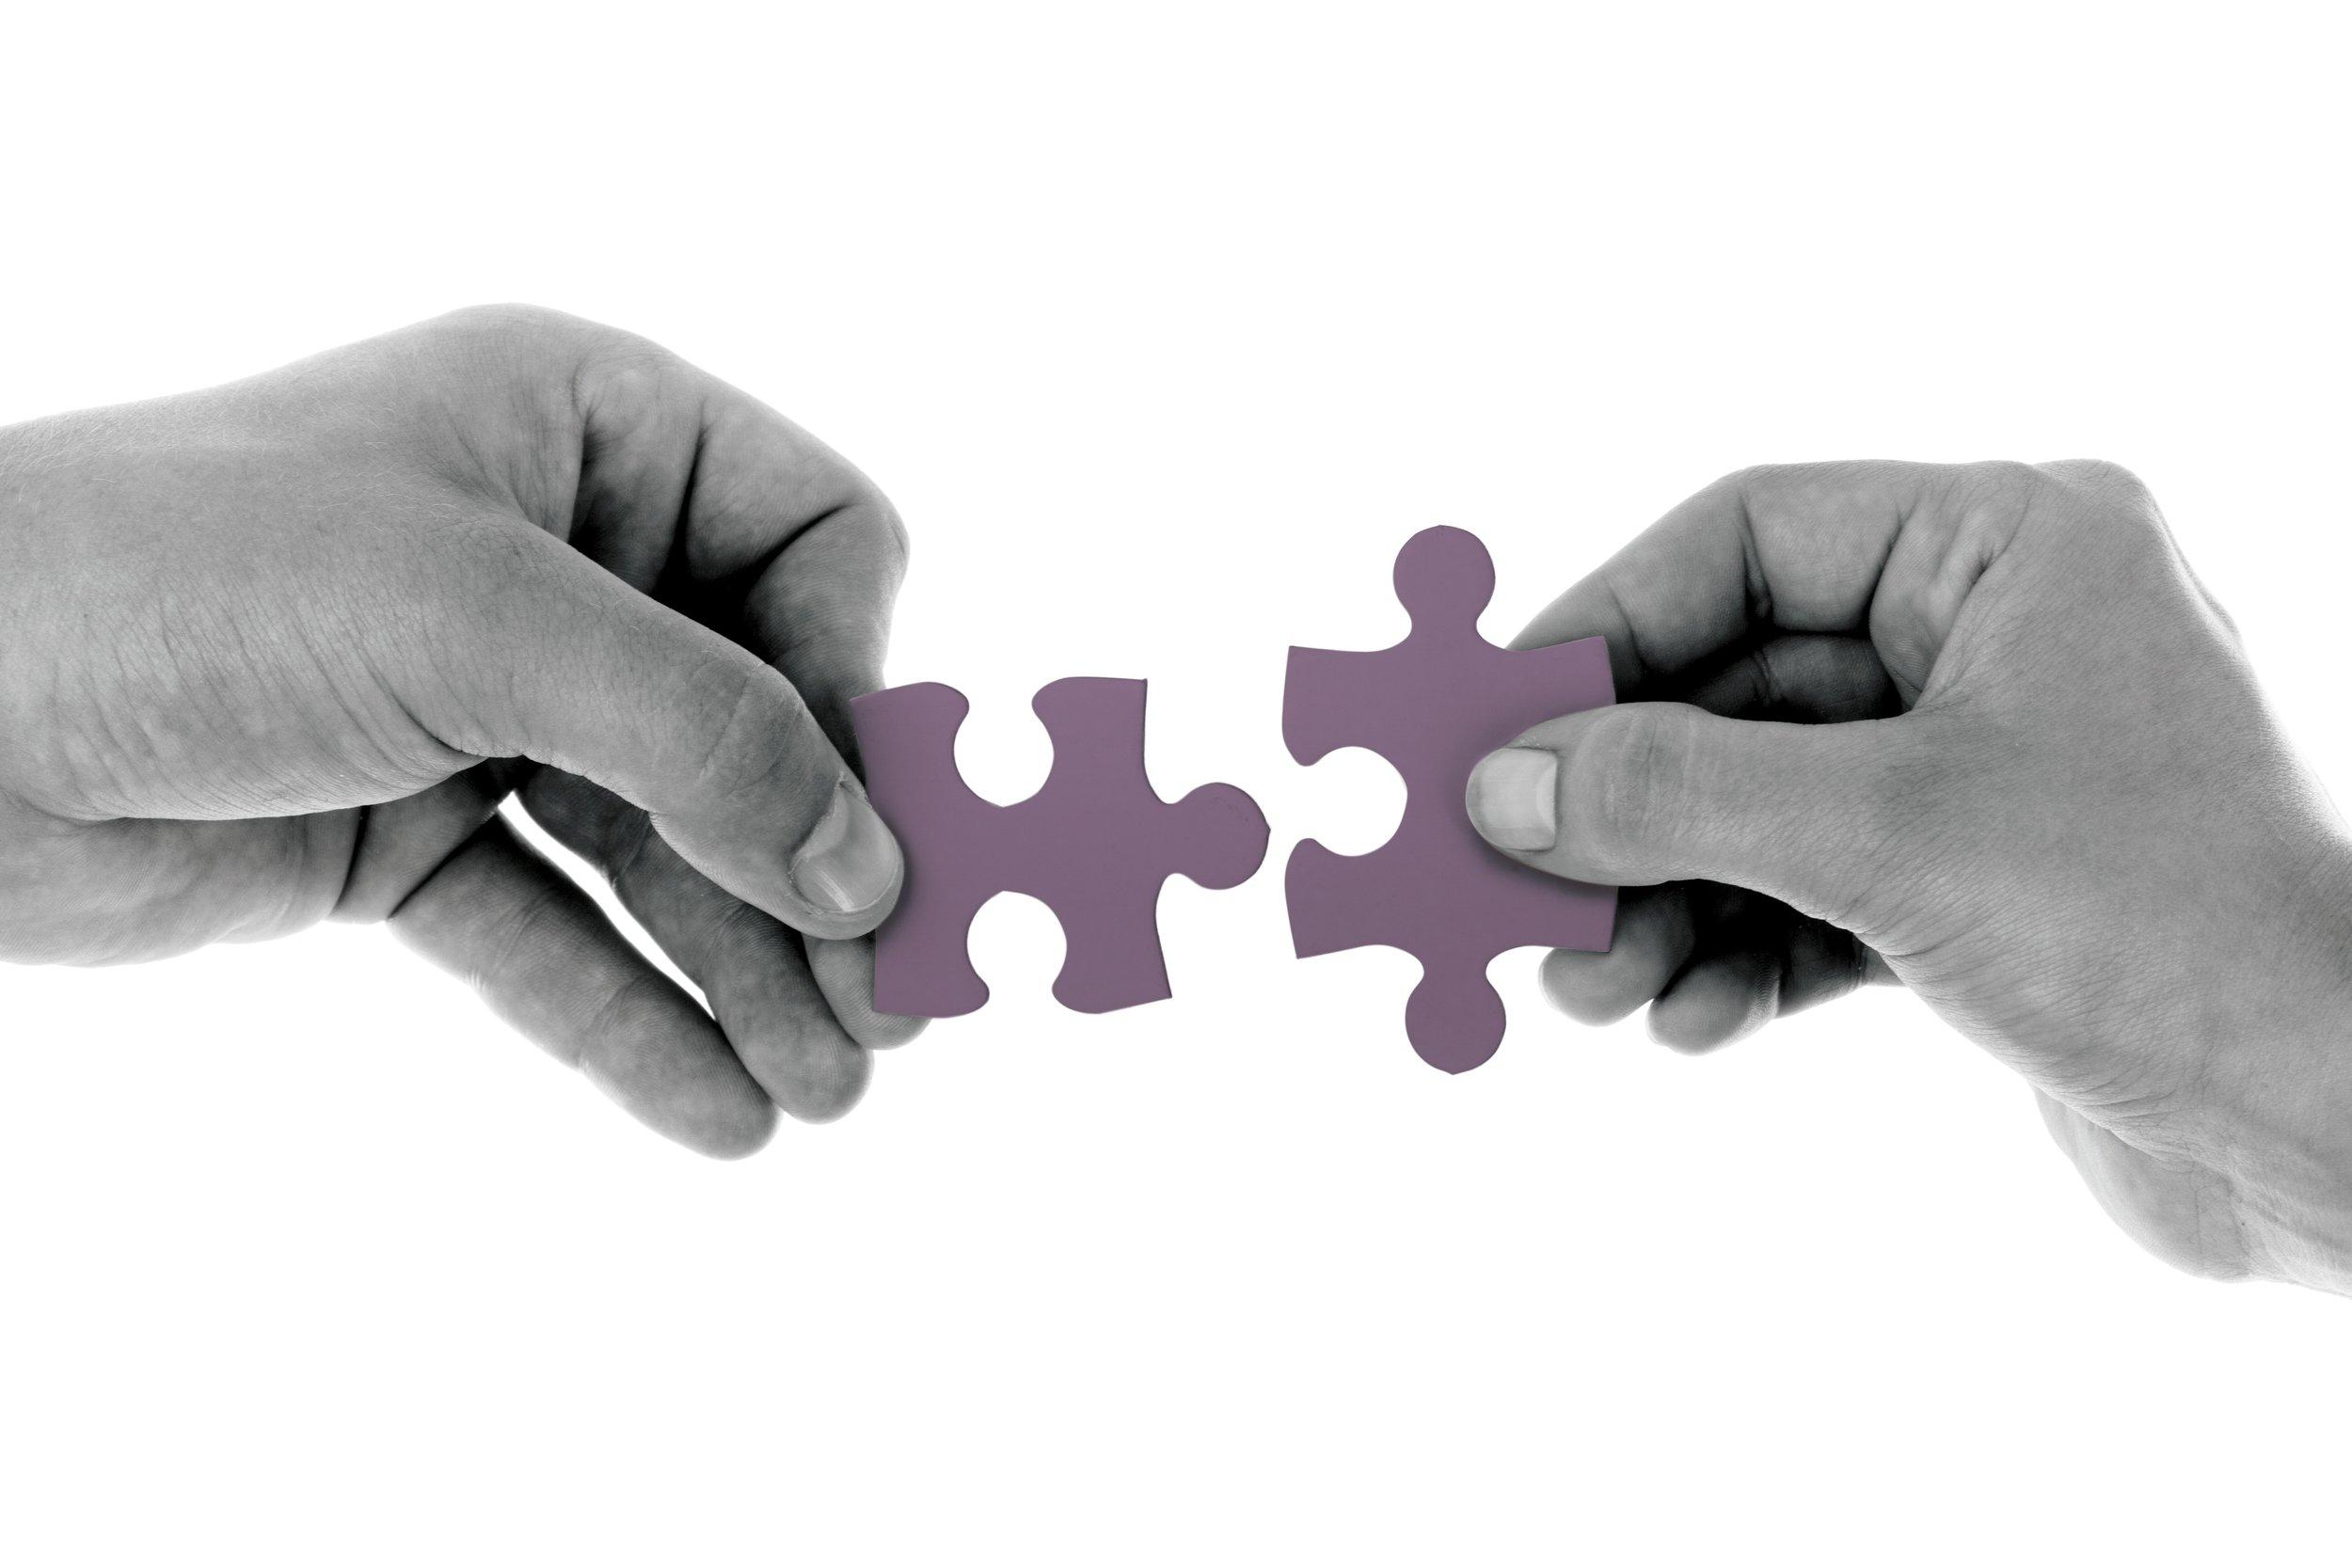 Partnership Page Image #1 Puzzle Pieces.jpg